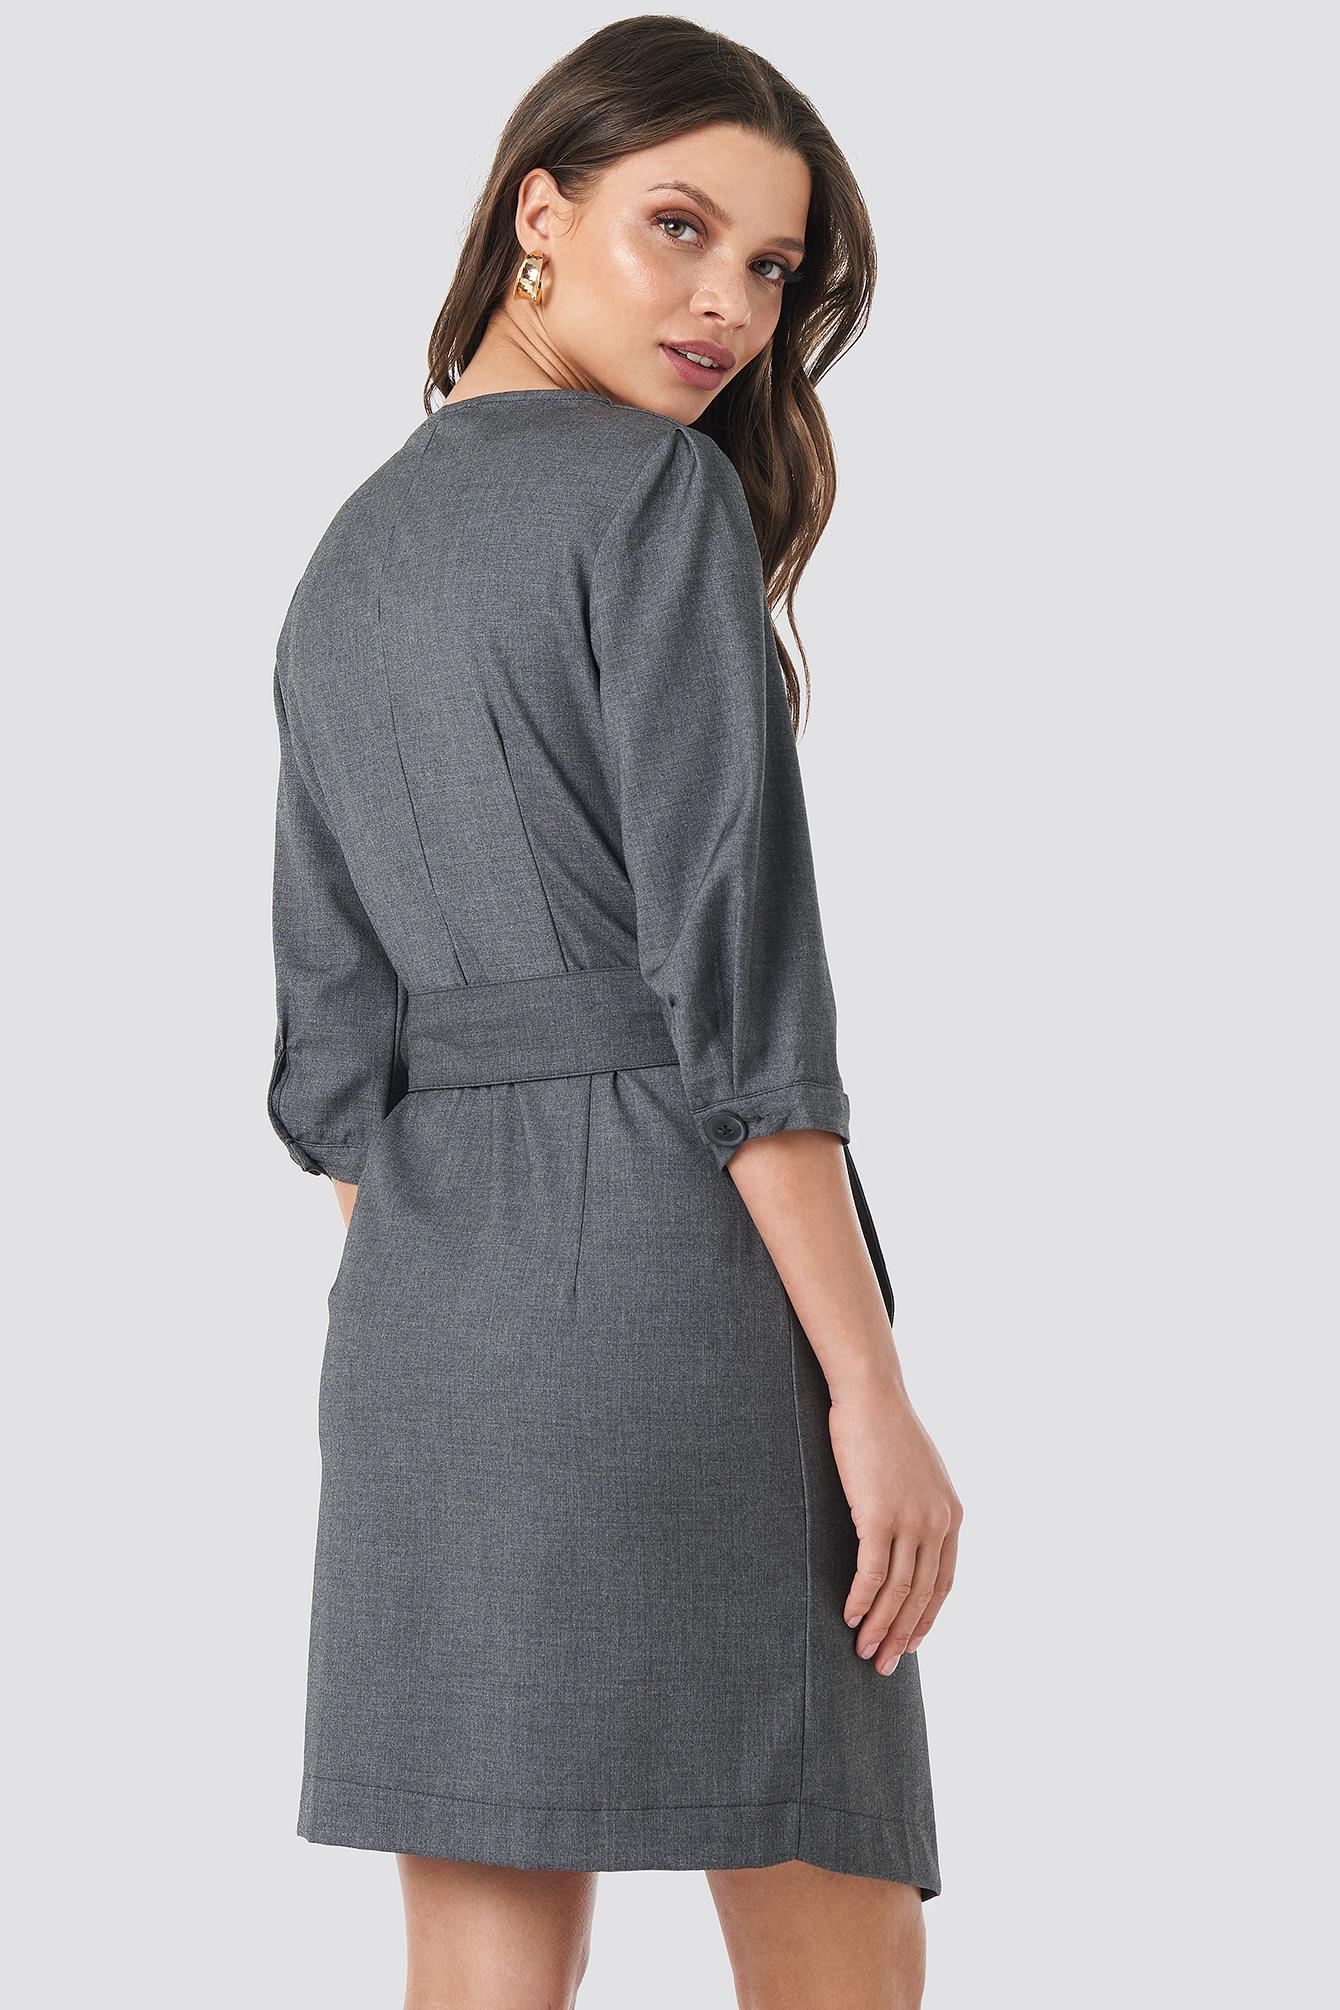 Milly Dress NA-KD.COM